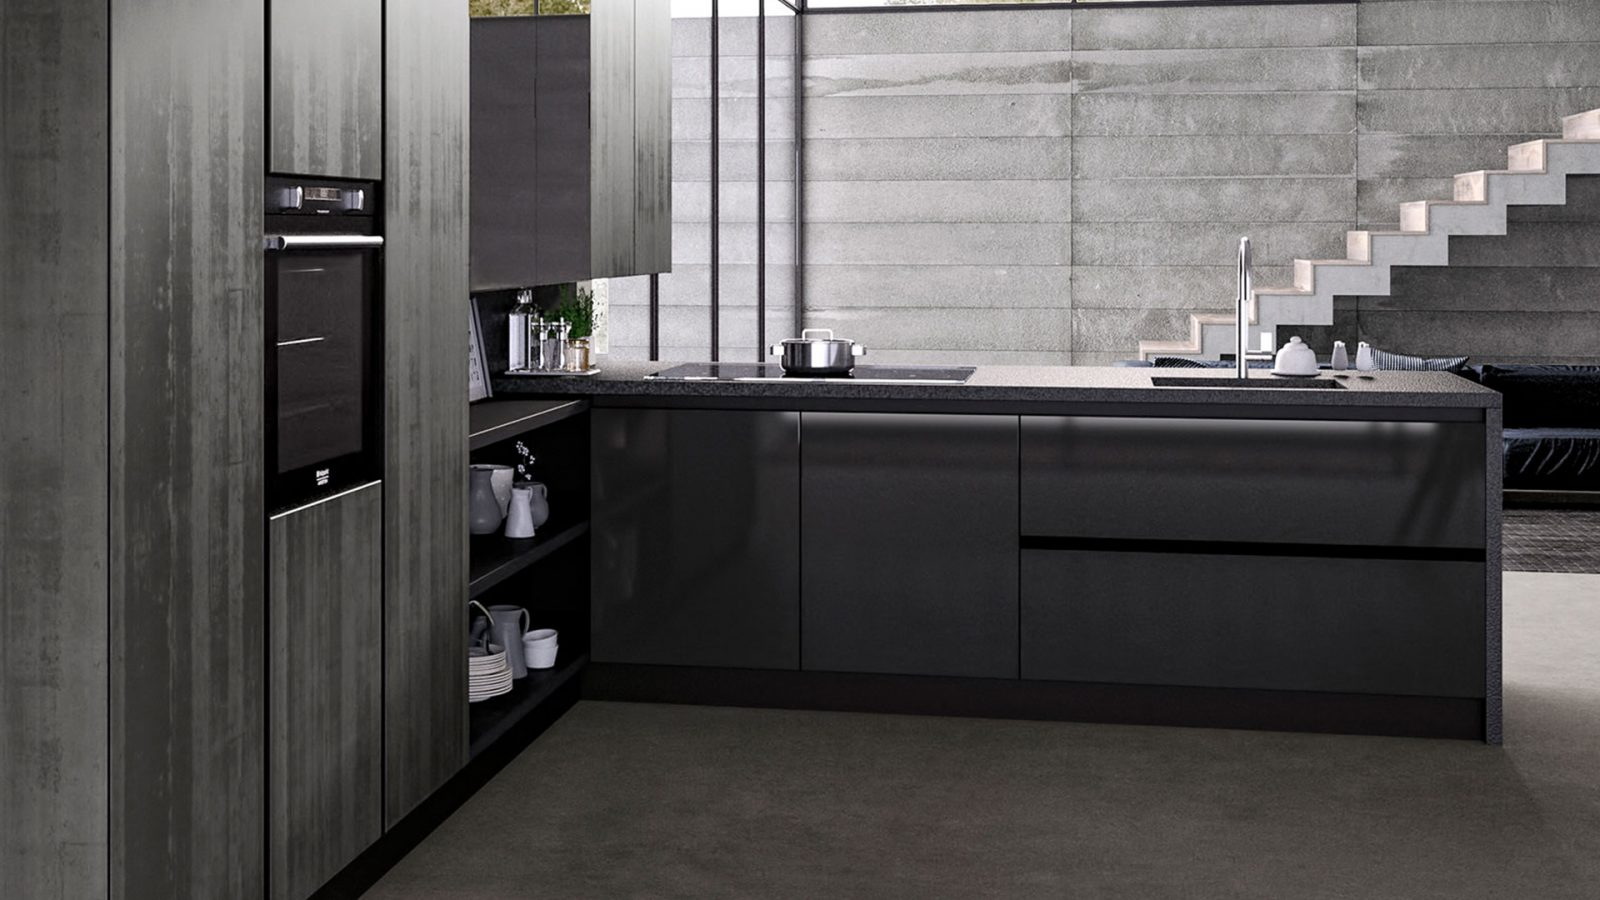 Cucine su misura a padova progettazione gratuita - Cucine a padova ...